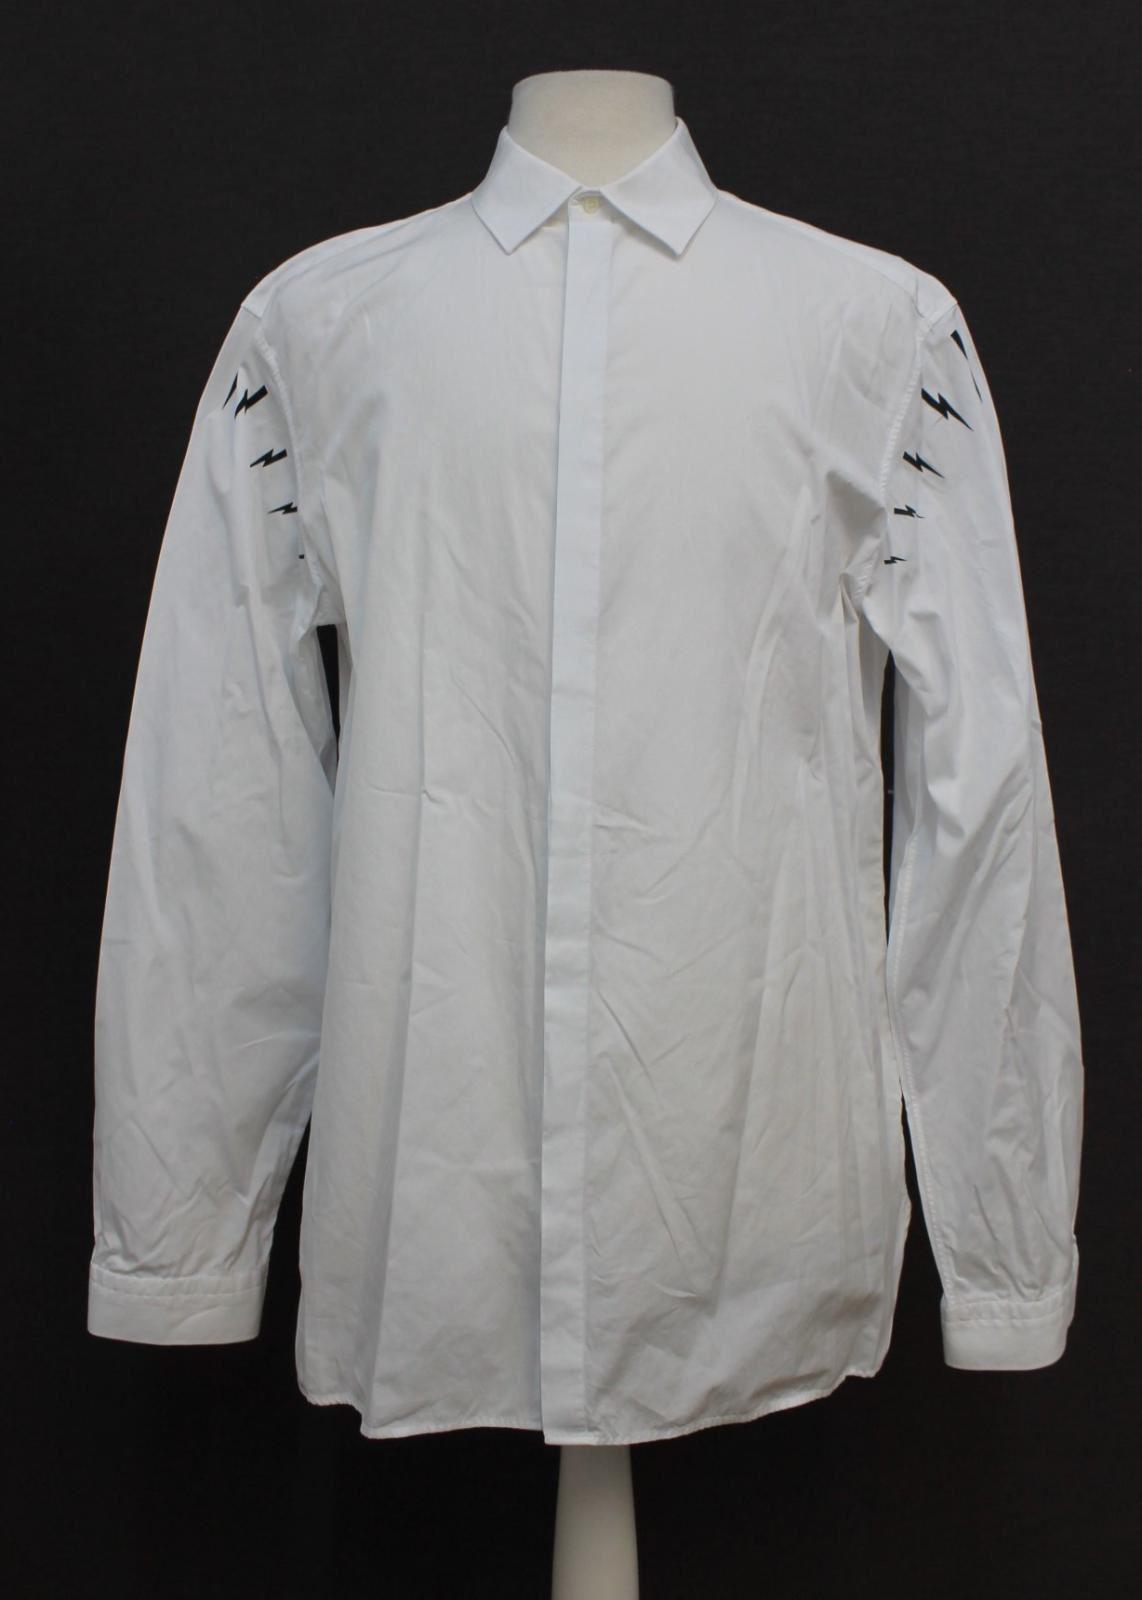 Neil-barrett-hombre-blanco-de-algodon-manga-de-Rayo-con-cuello-camisa-tamano-17-5-034